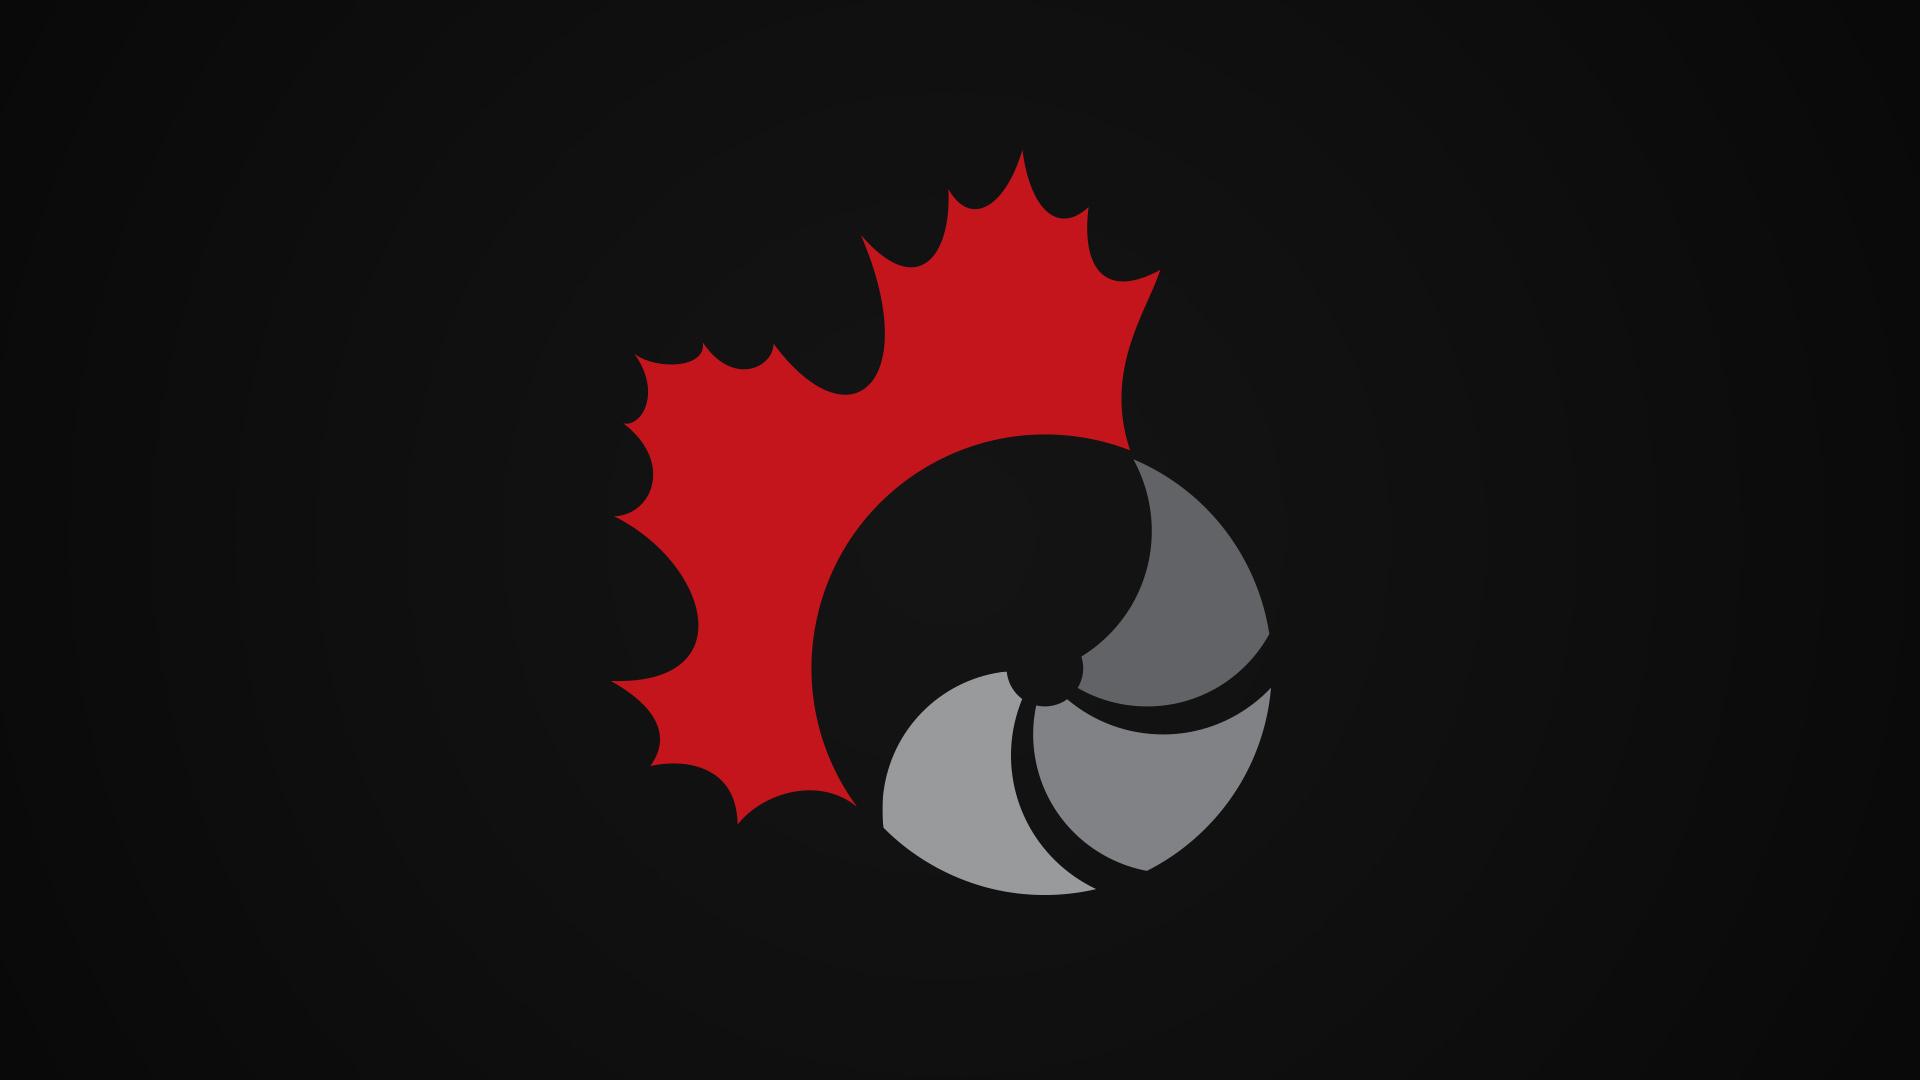 CCFR-Black.jpg